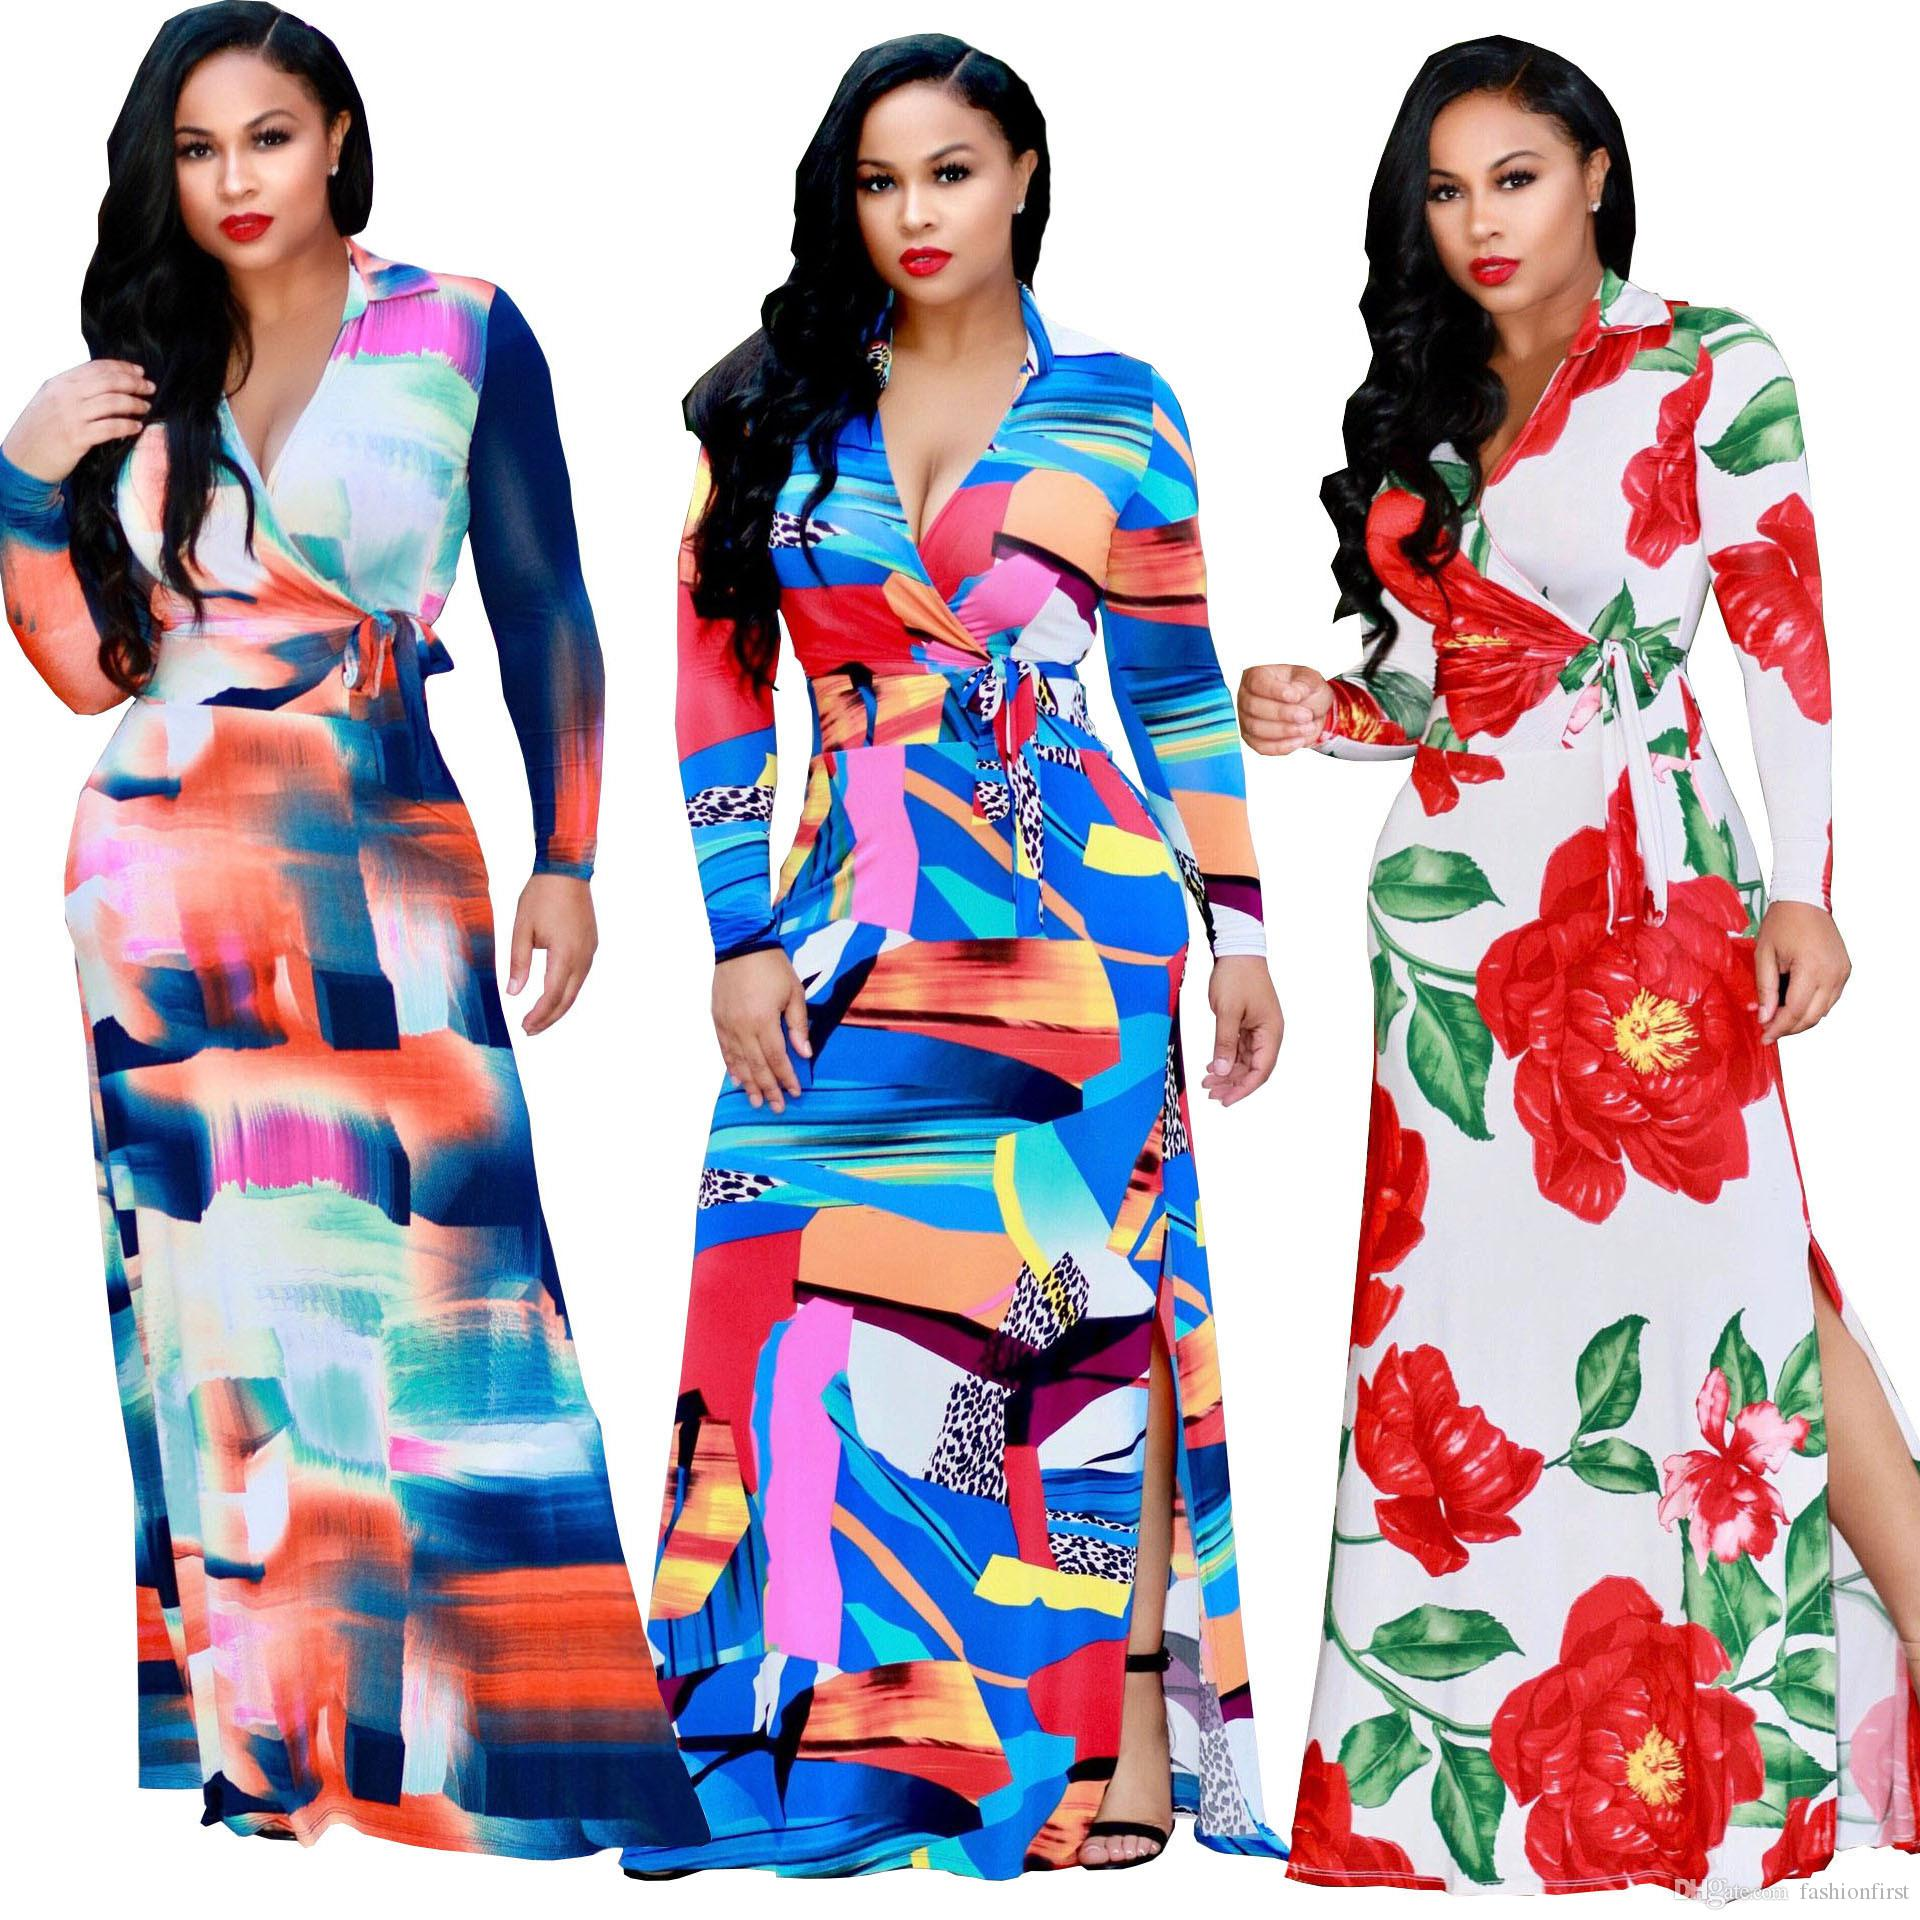 eddbfd314e5 African Clothing Rushed Women Clothing 2018 Fashion V Neck Posed Dress  Irregular Side Slit Beautiful Plus Size Printing Belt Dress Shop Dresses  Discount ...